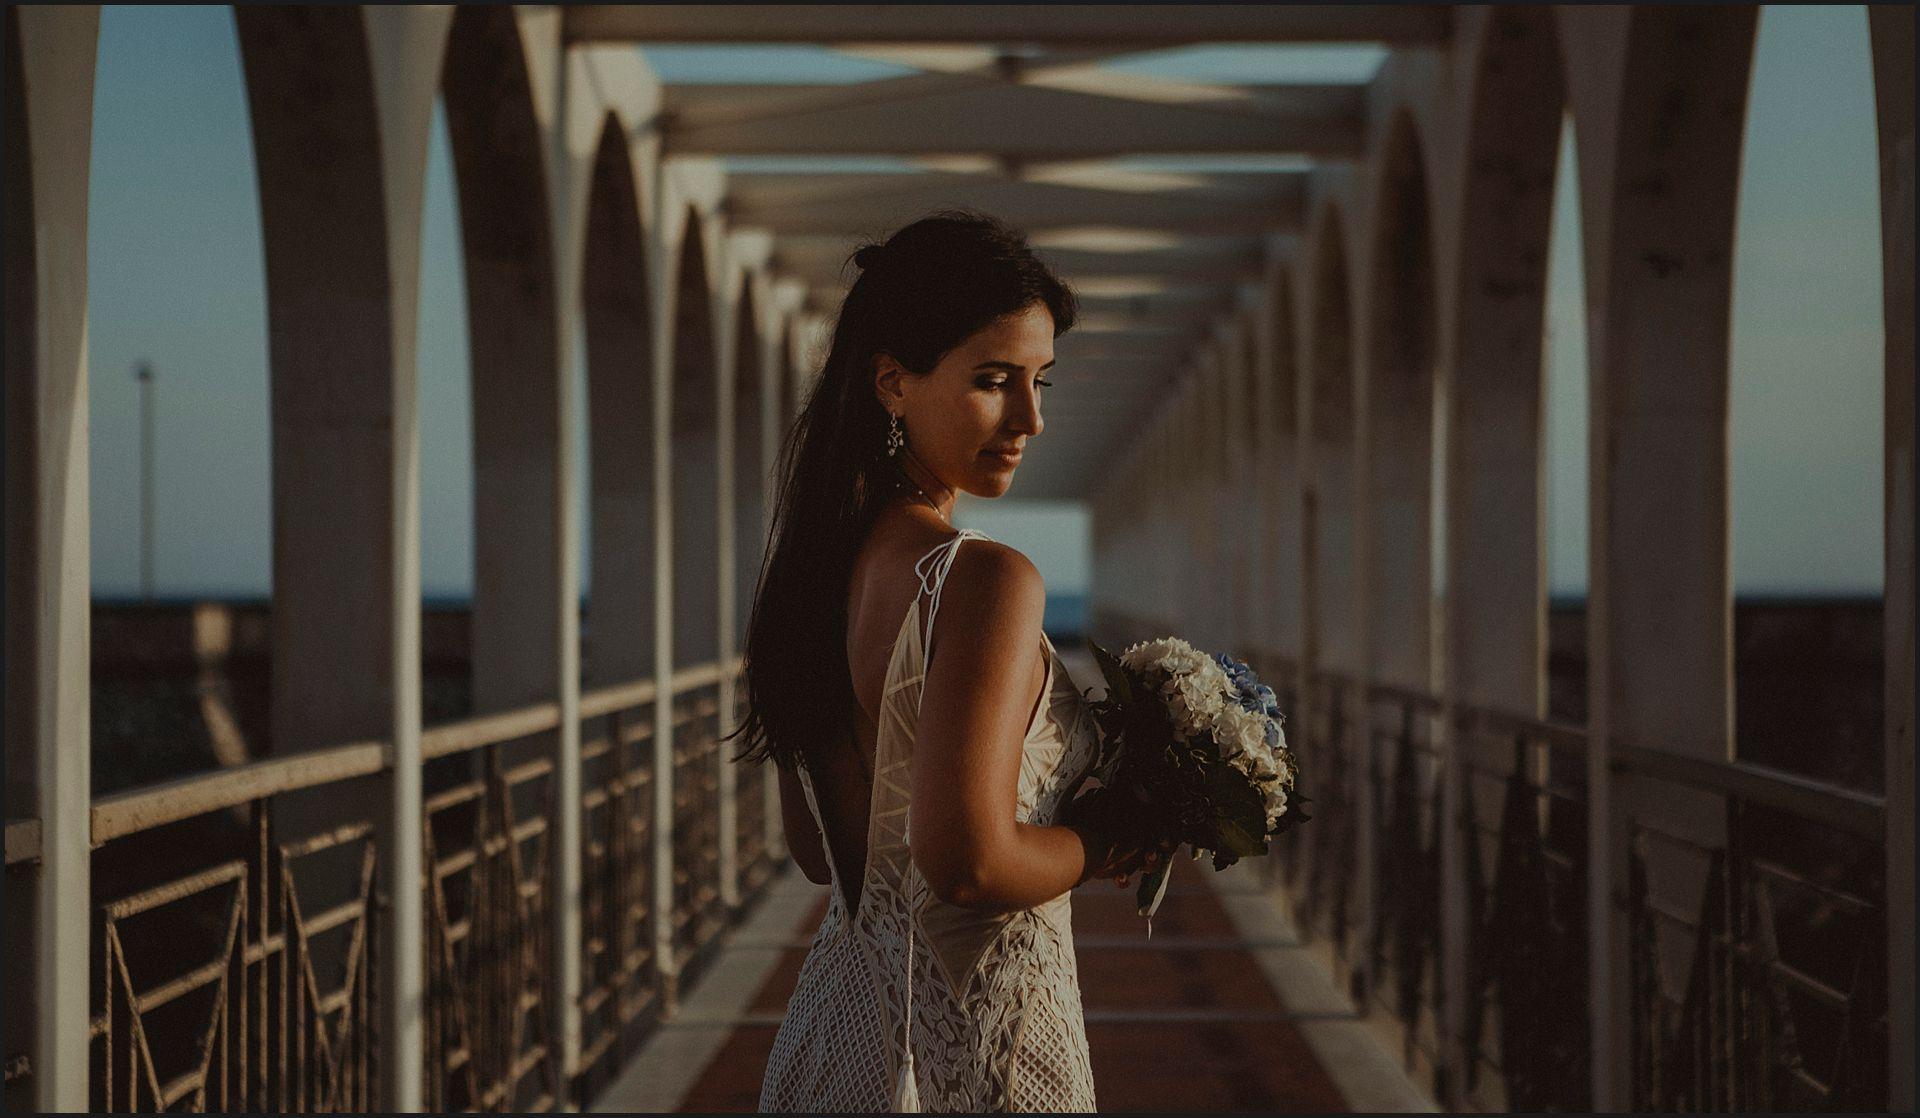 bride, italy,  wedding portrait, natural light, bridge, symmetry, grometries, seaside, flowers, bouquet, sunset, warm light